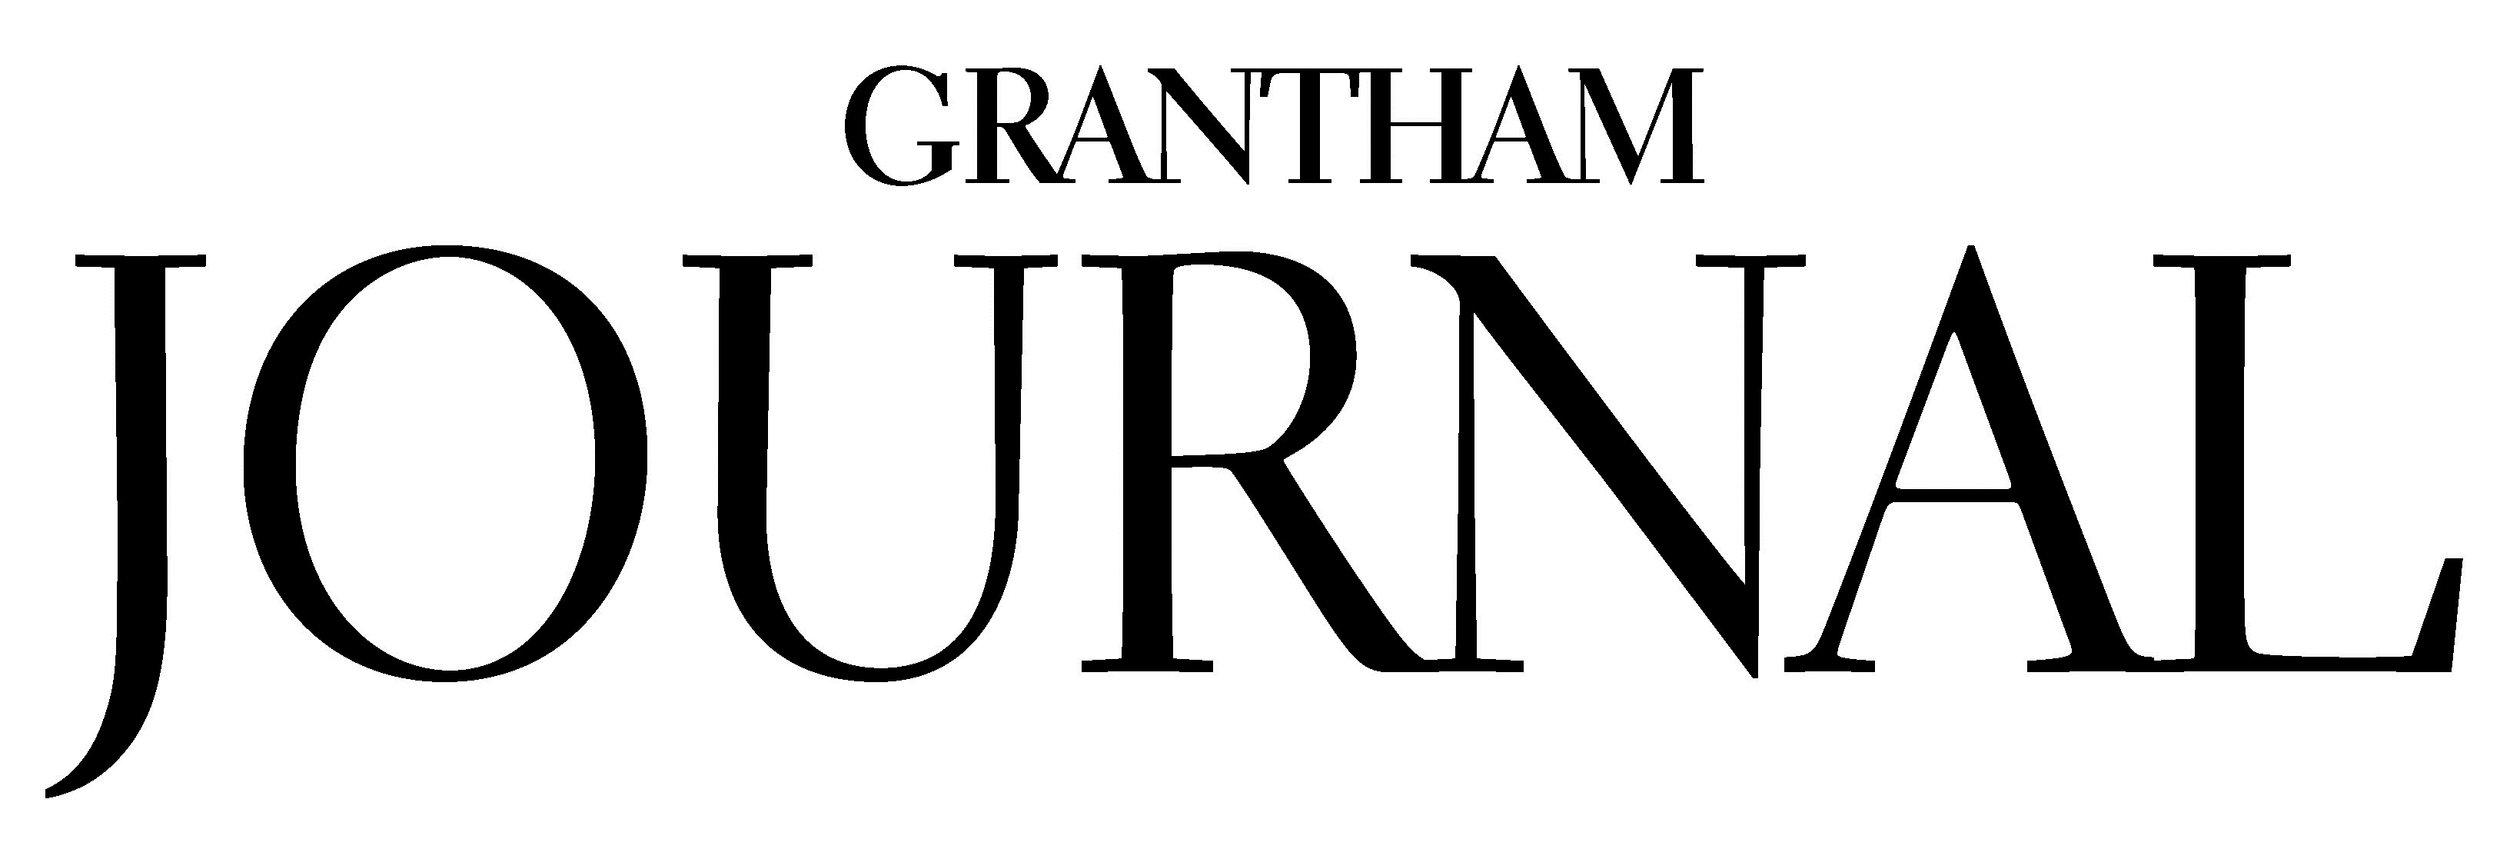 Grantham Journal Masthead BLACK - cropped.jpg